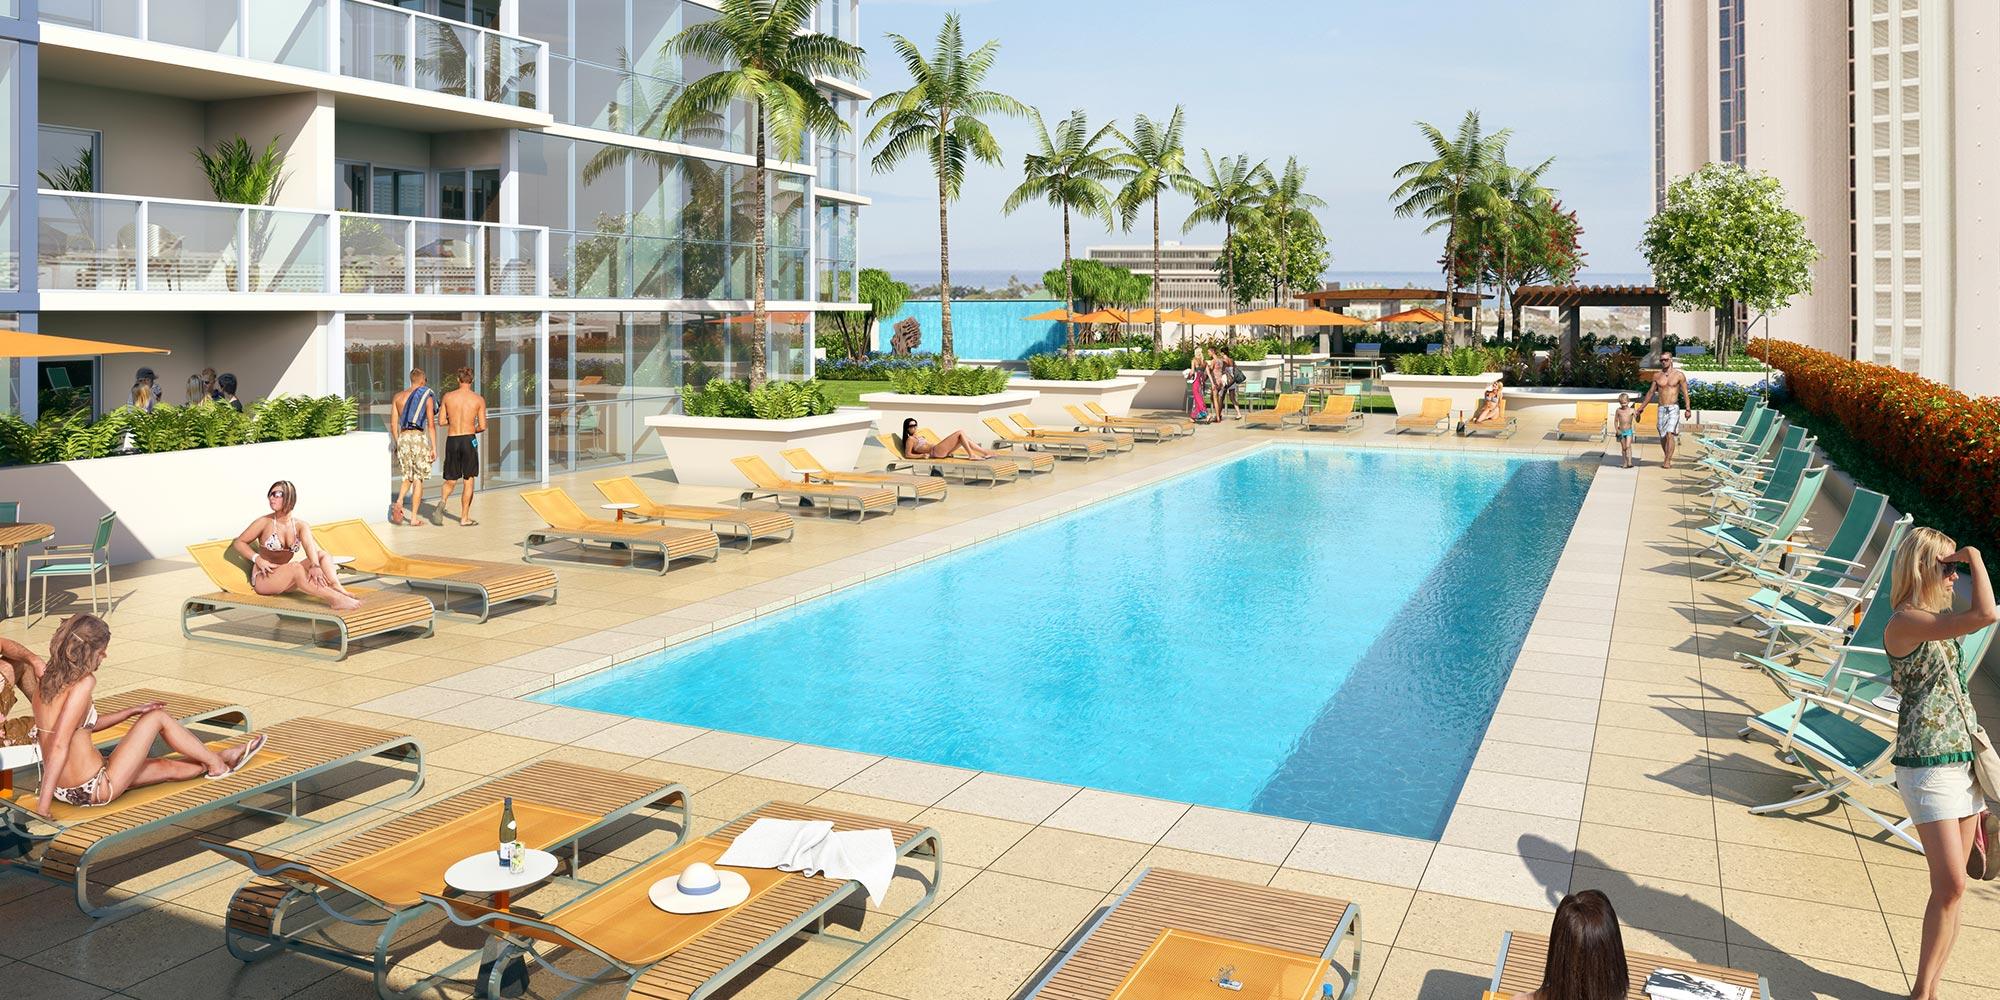 Keauhou Place condo pool